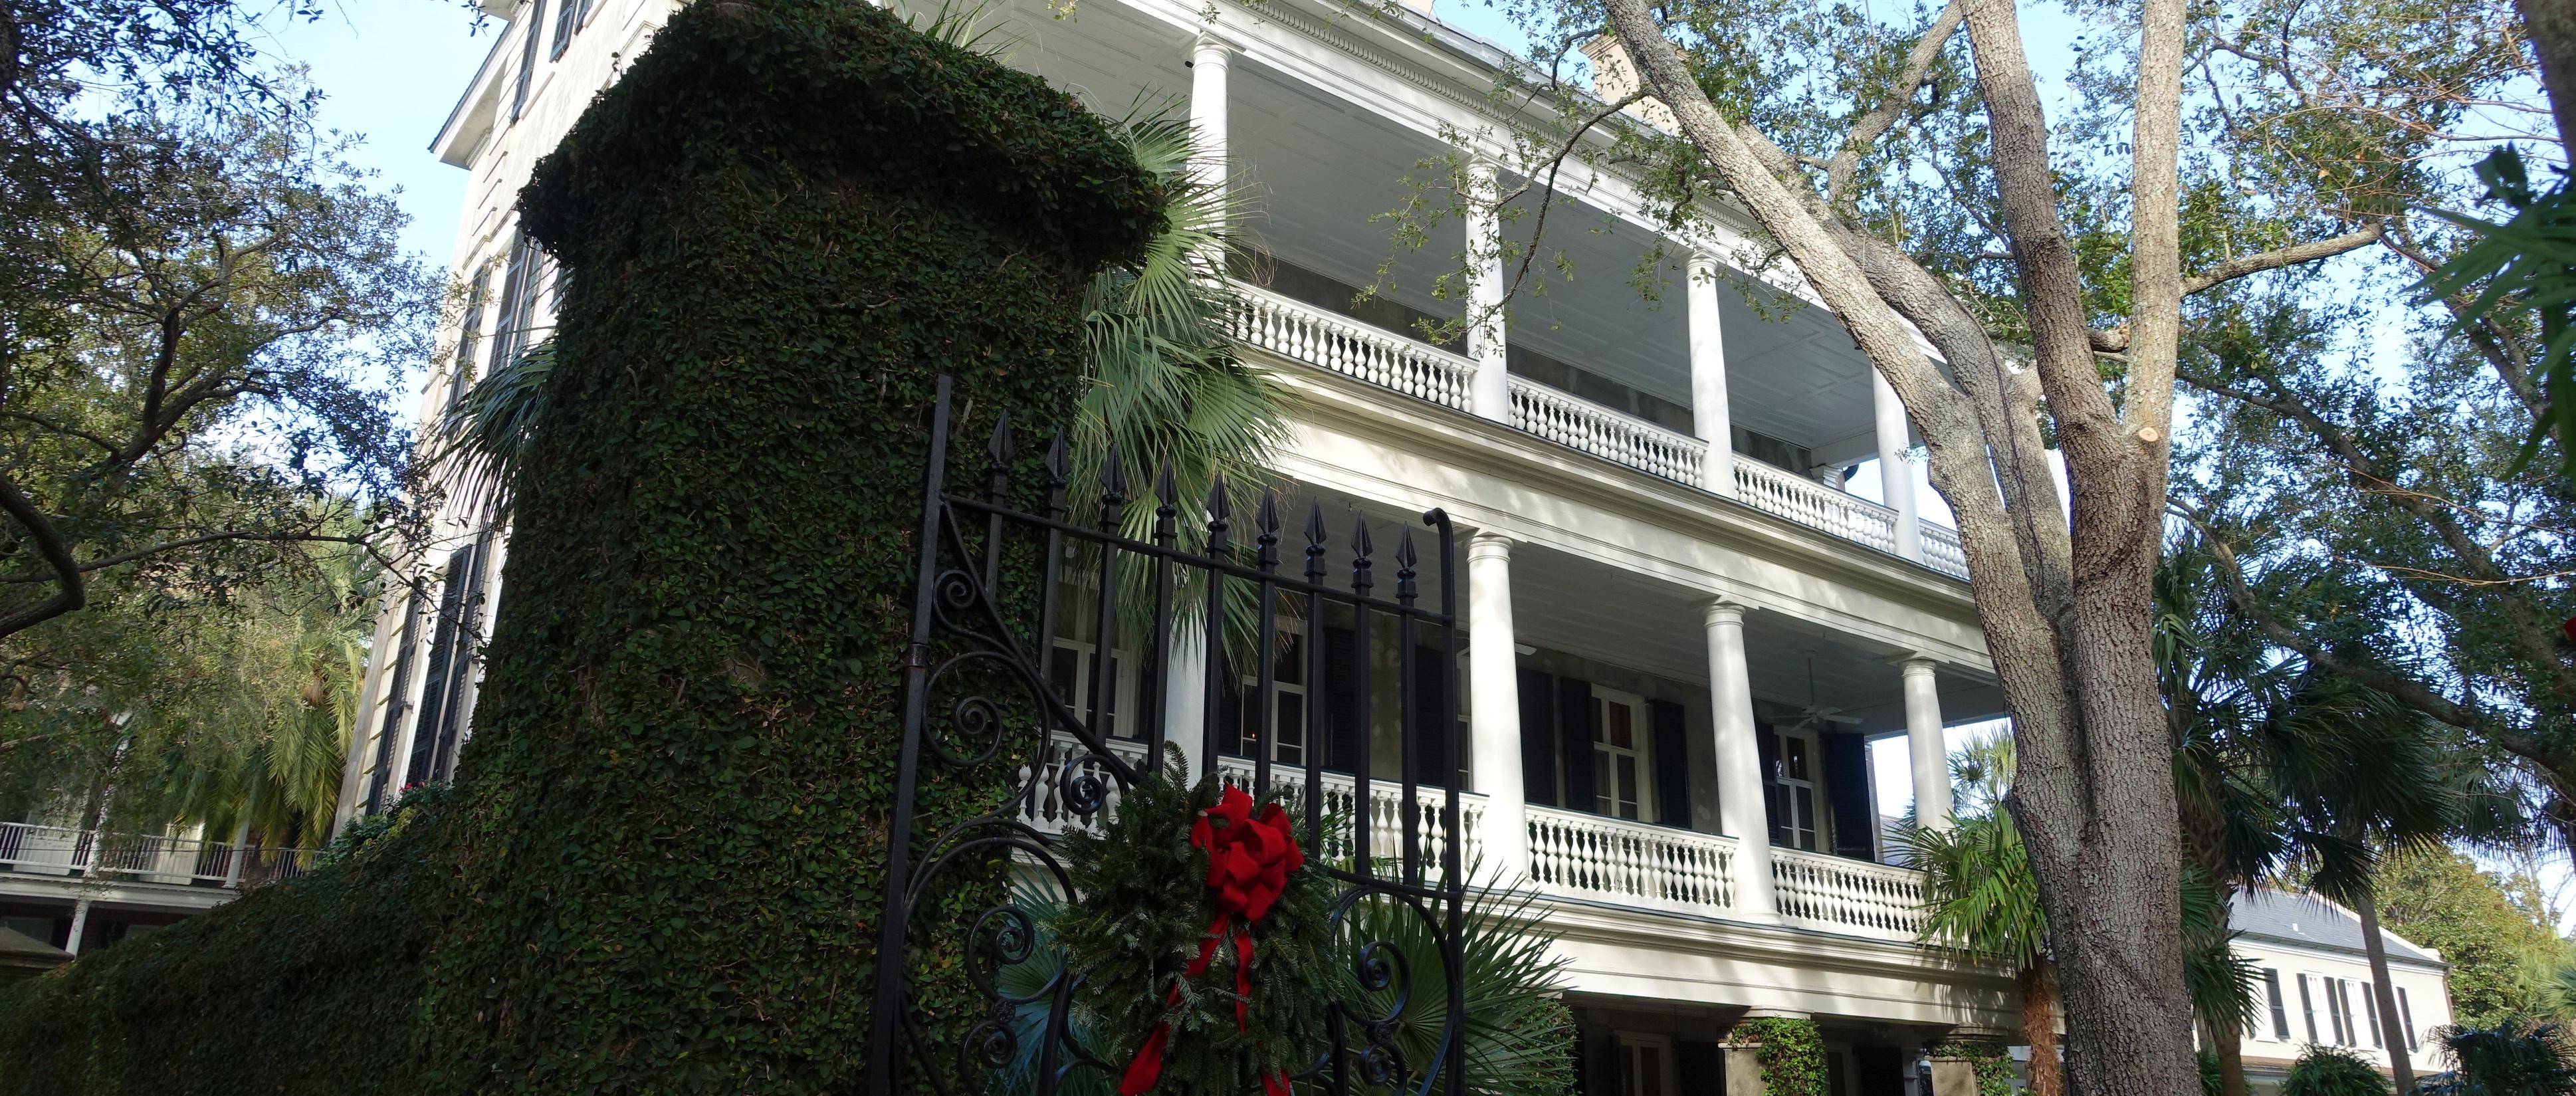 'Gettin the Word & Gettin' the Ghost' in Charleston South Carolina – US Deep South 2017